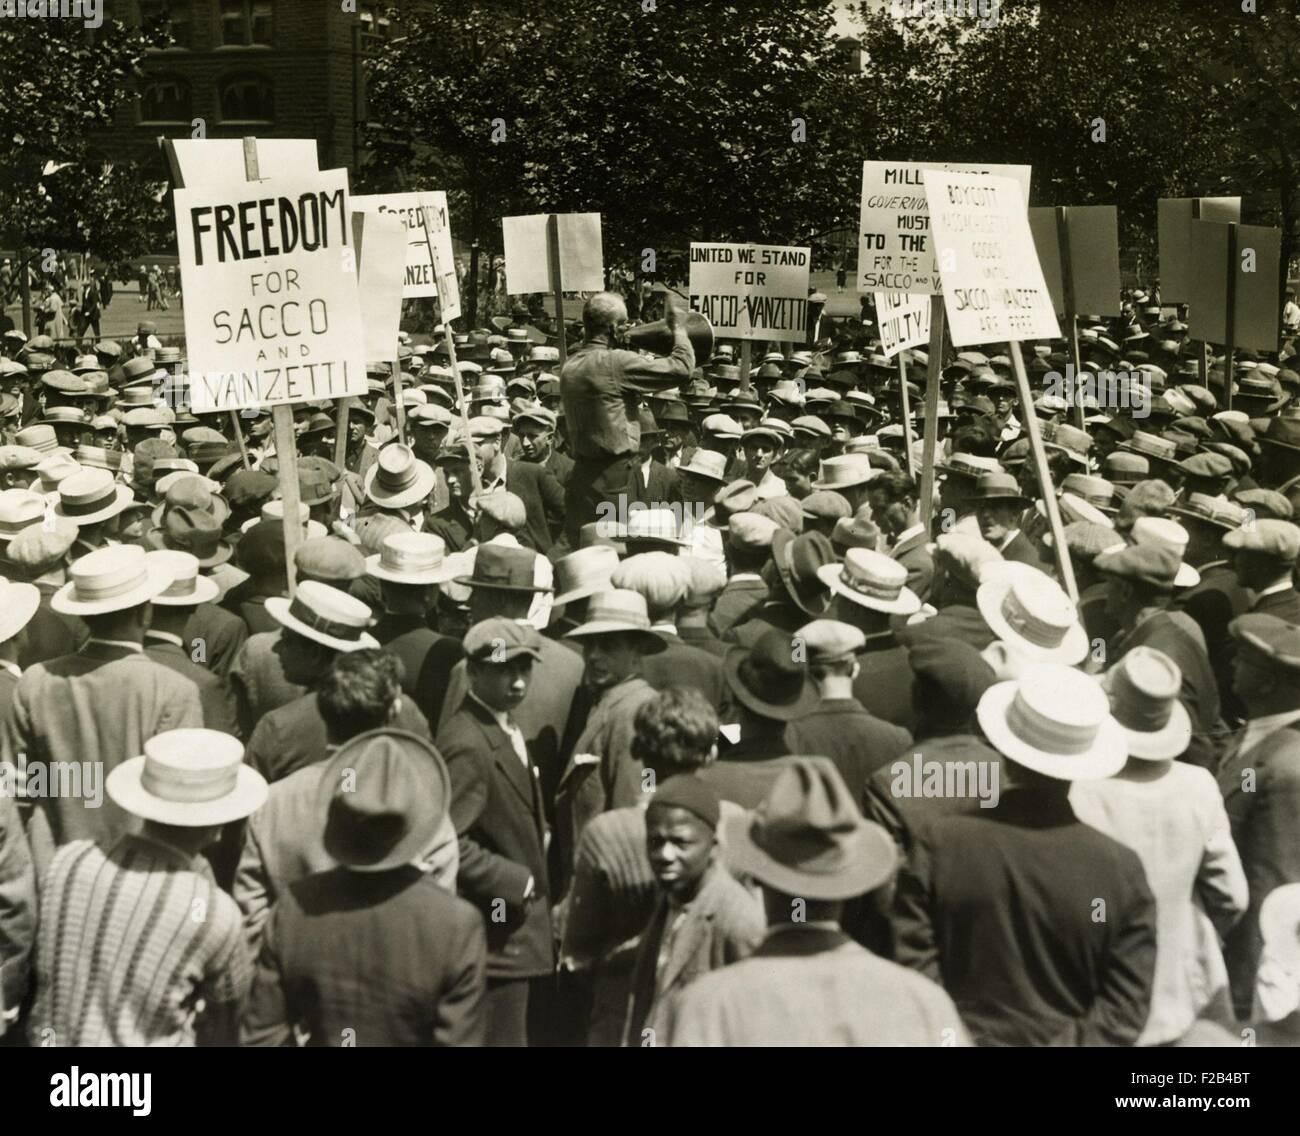 Socialists protest the death sentences of Nicola Sacco and Bartolomeo Vanzetti. Union Square, NYC. Ca. August 13, - Stock Image